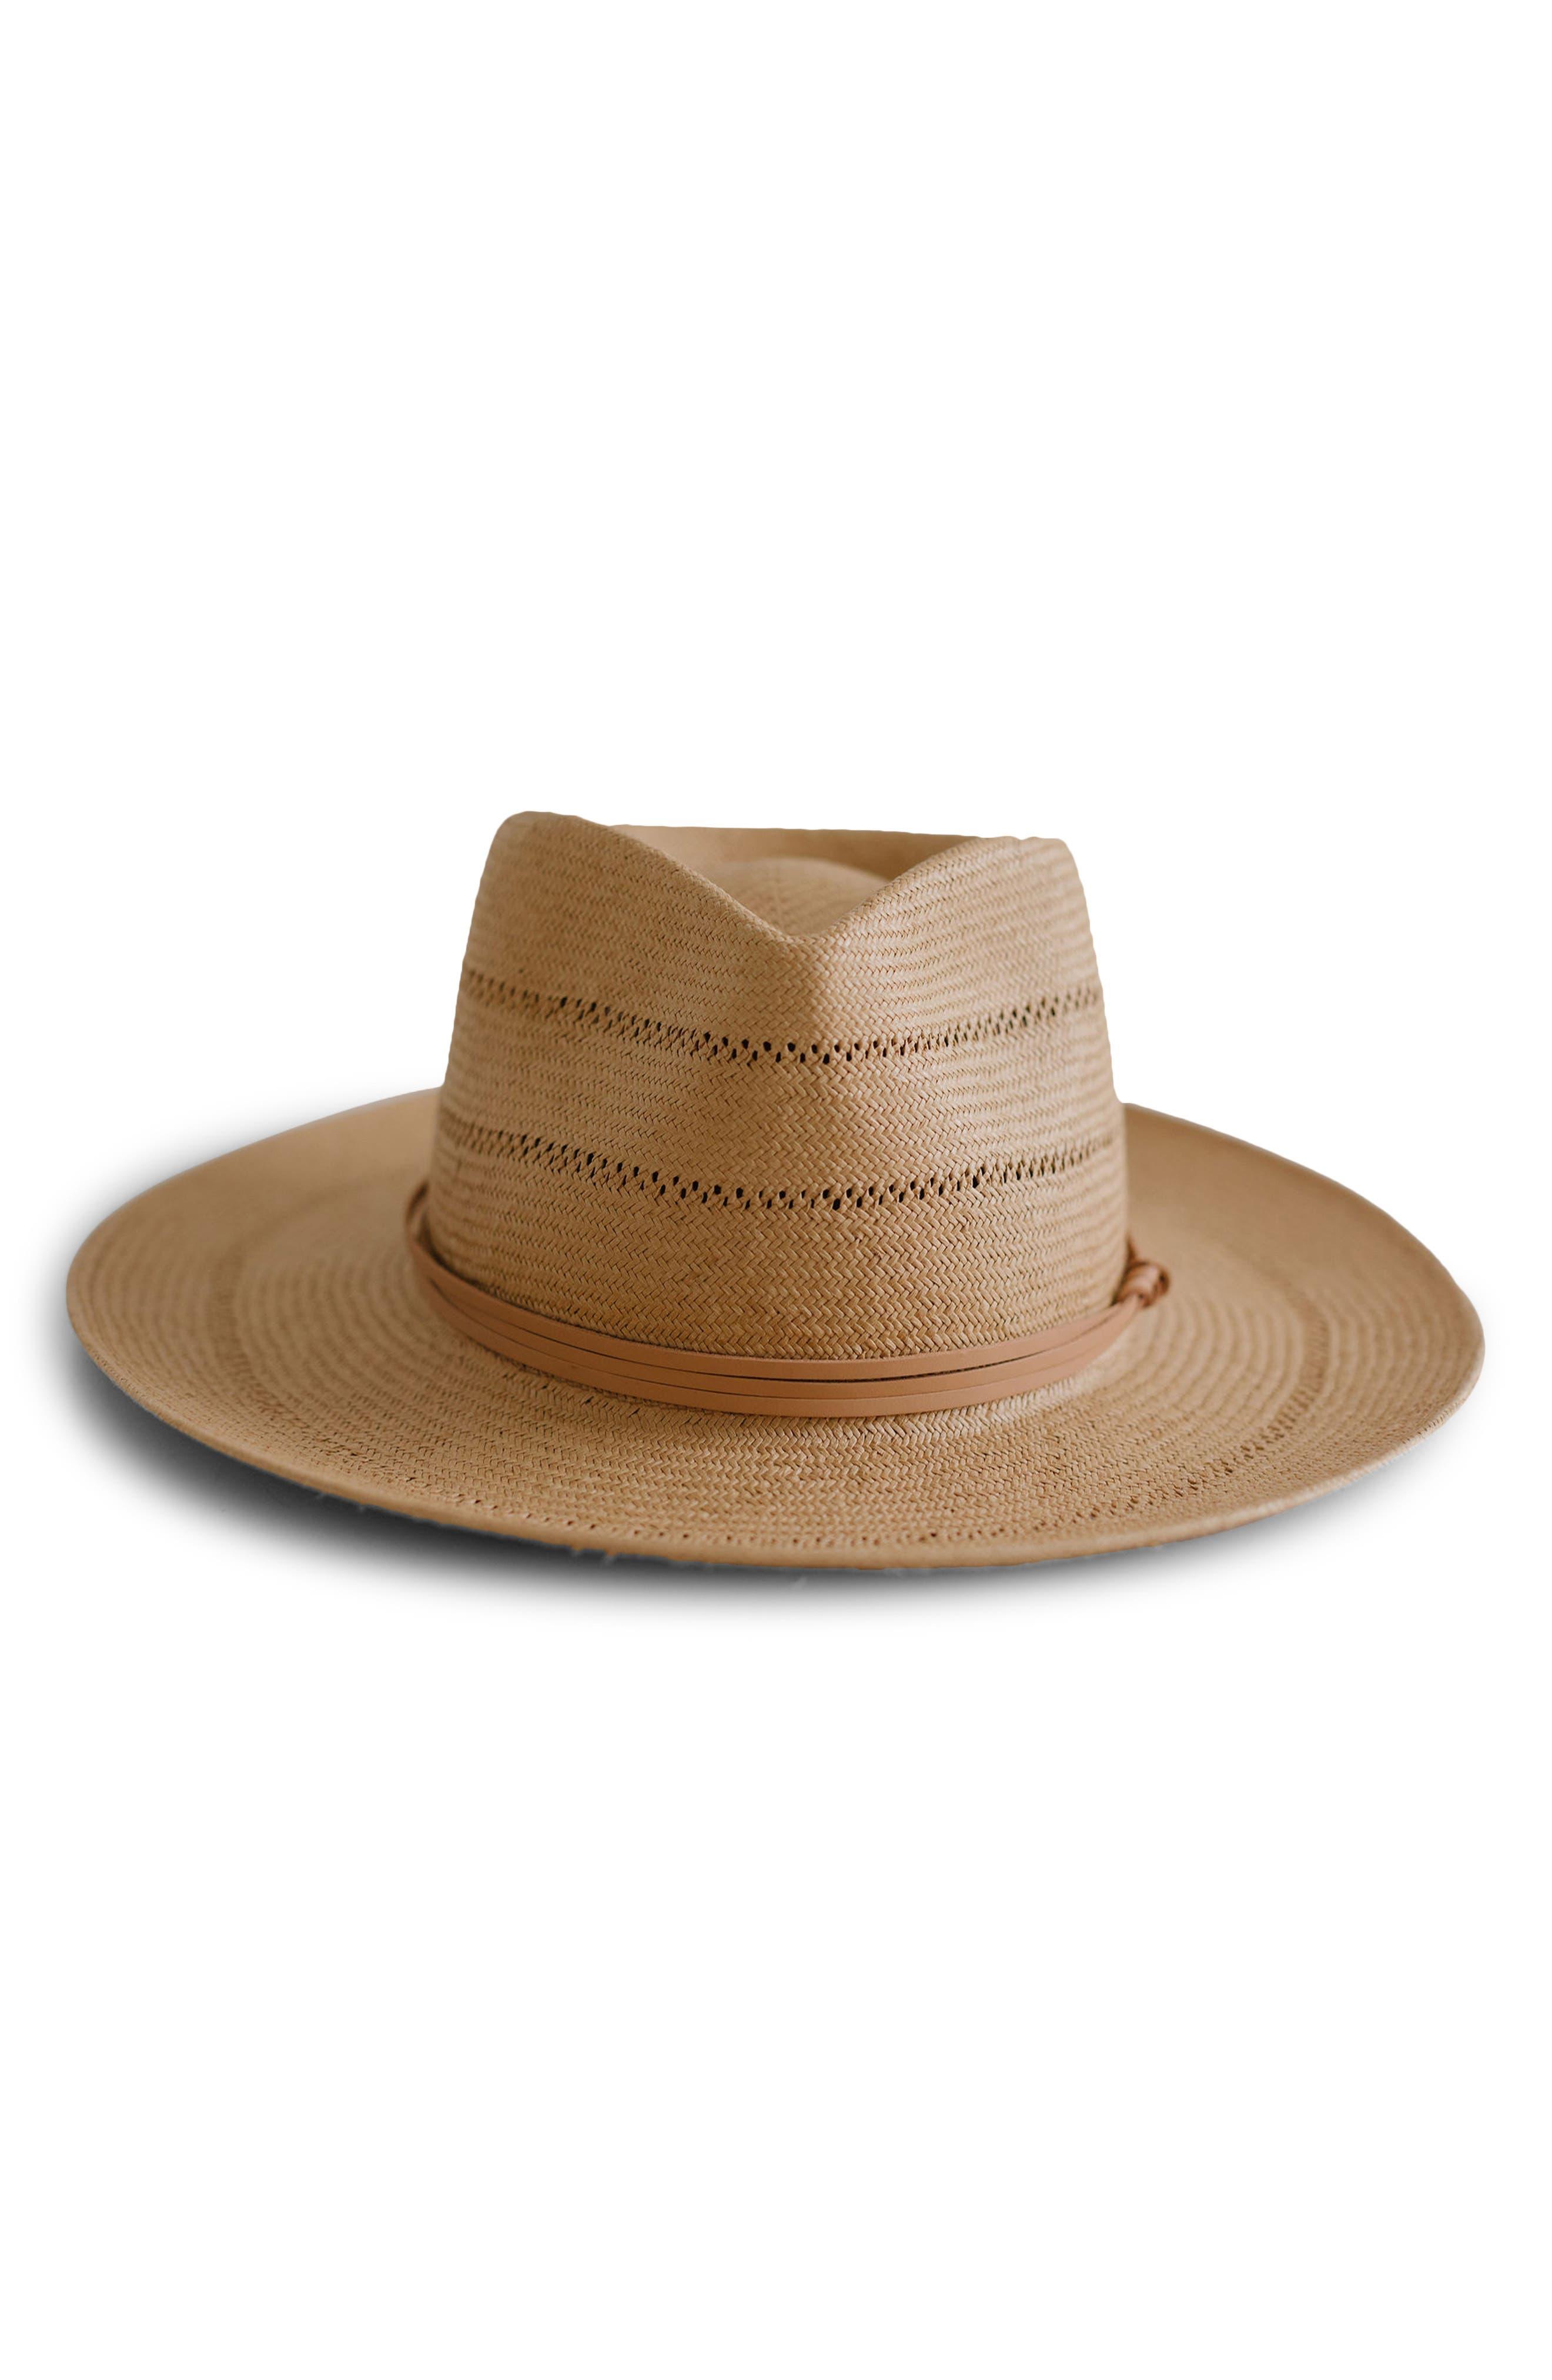 Straw Teardrop Fedora Hat